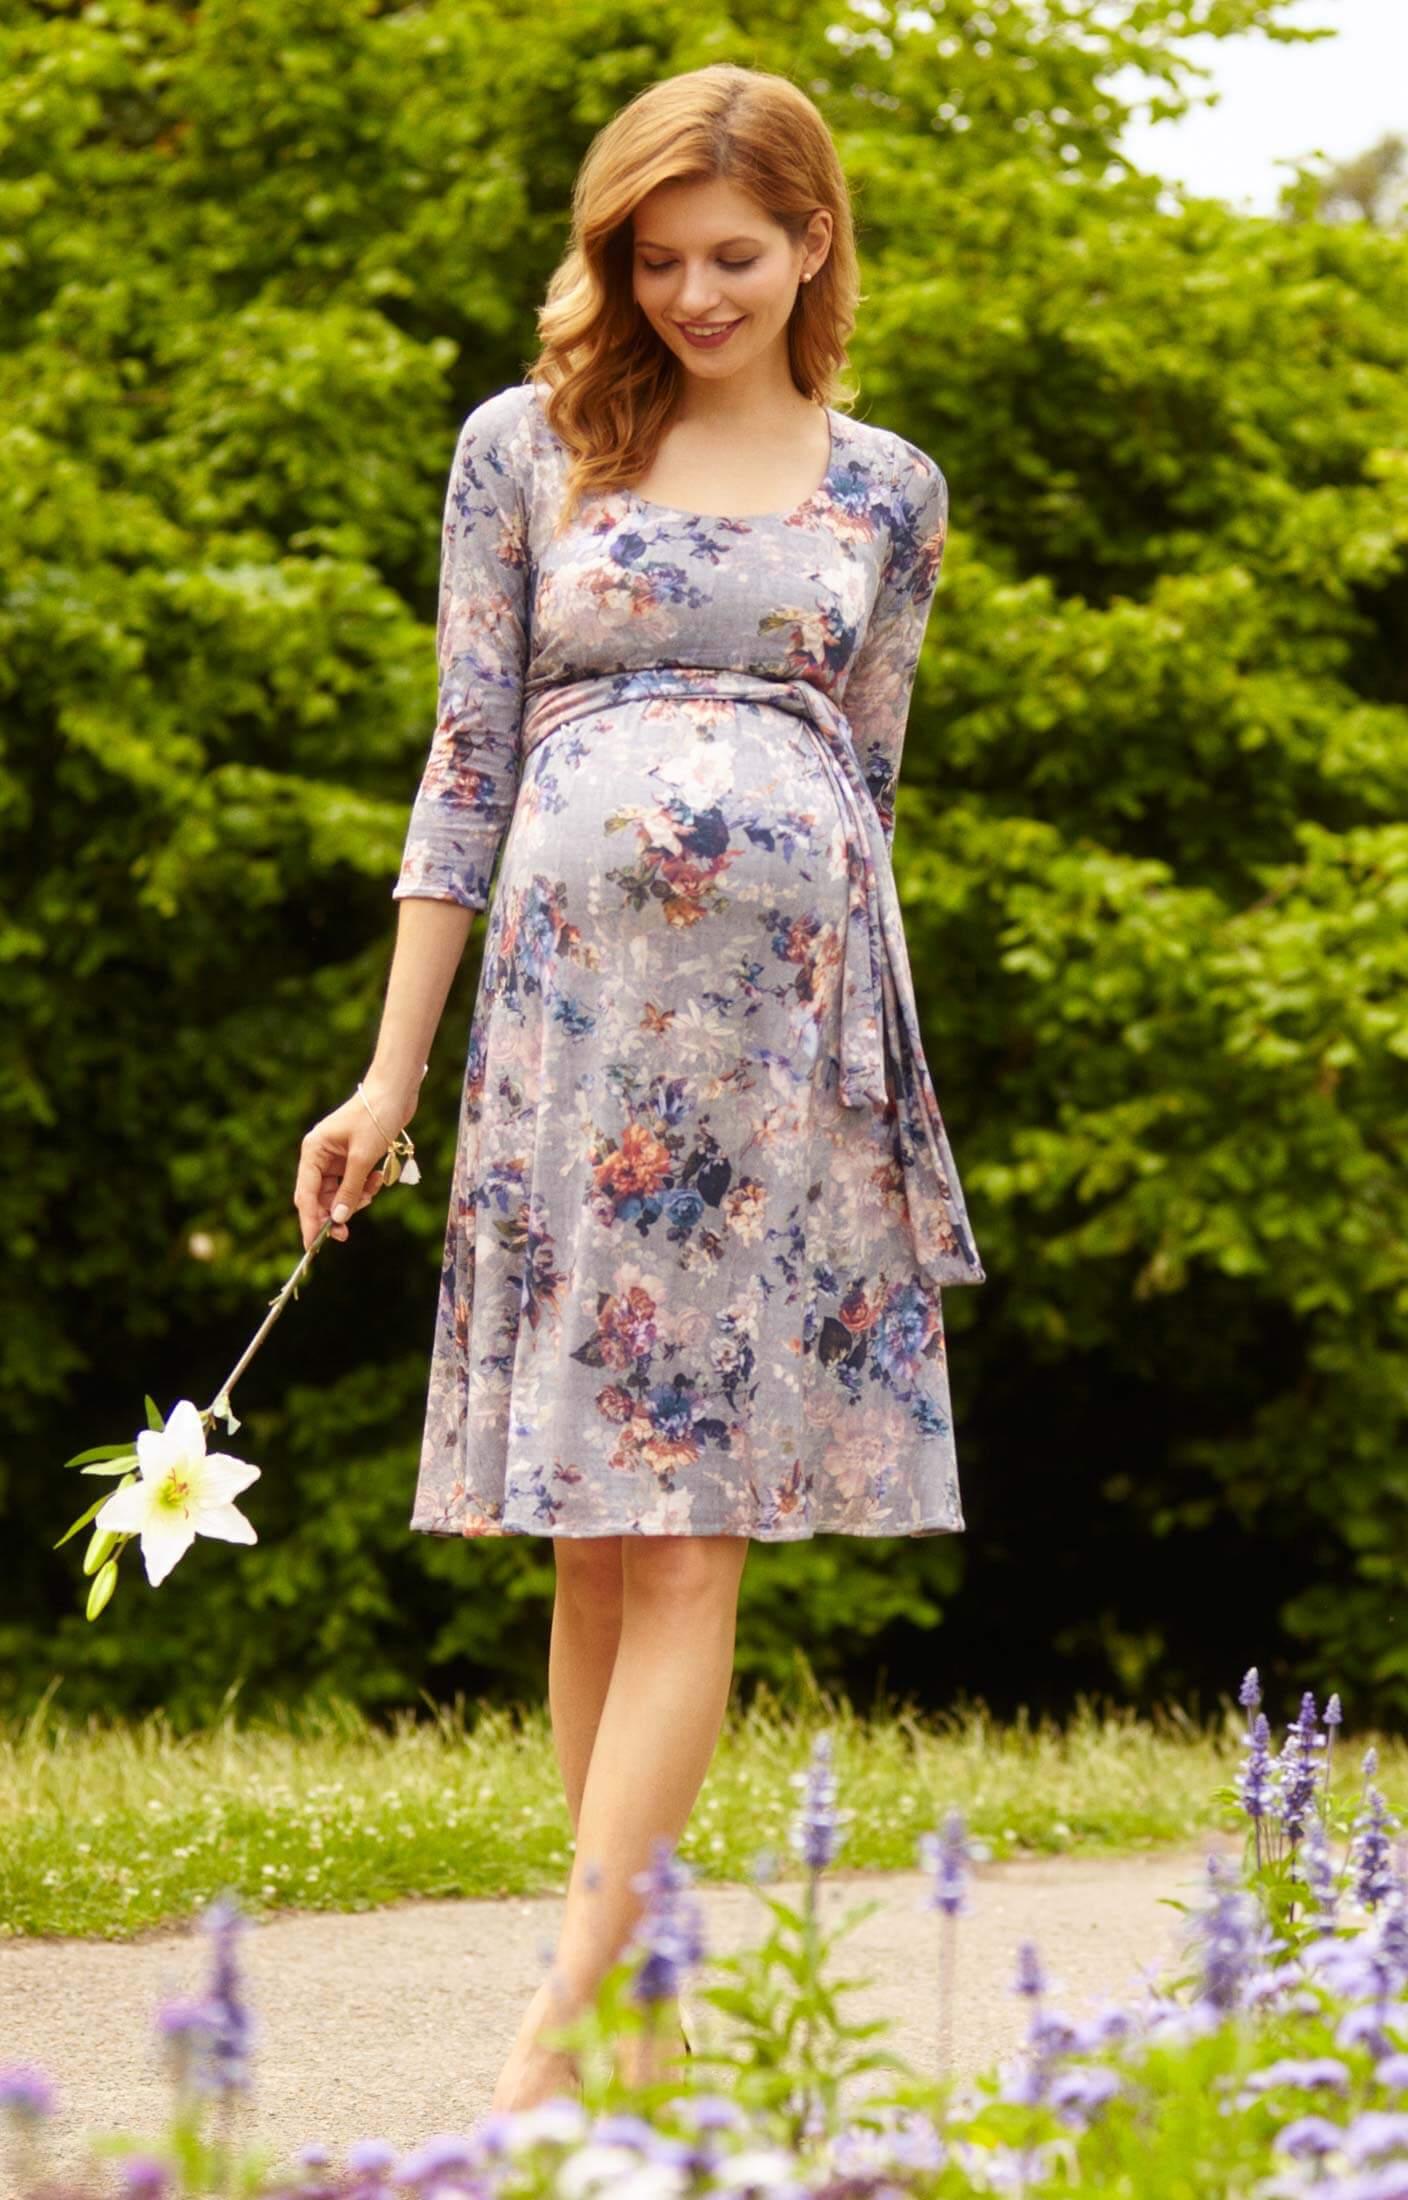 Naomi nursing dress vintage bloom maternity wedding for Nursing dresses for wedding